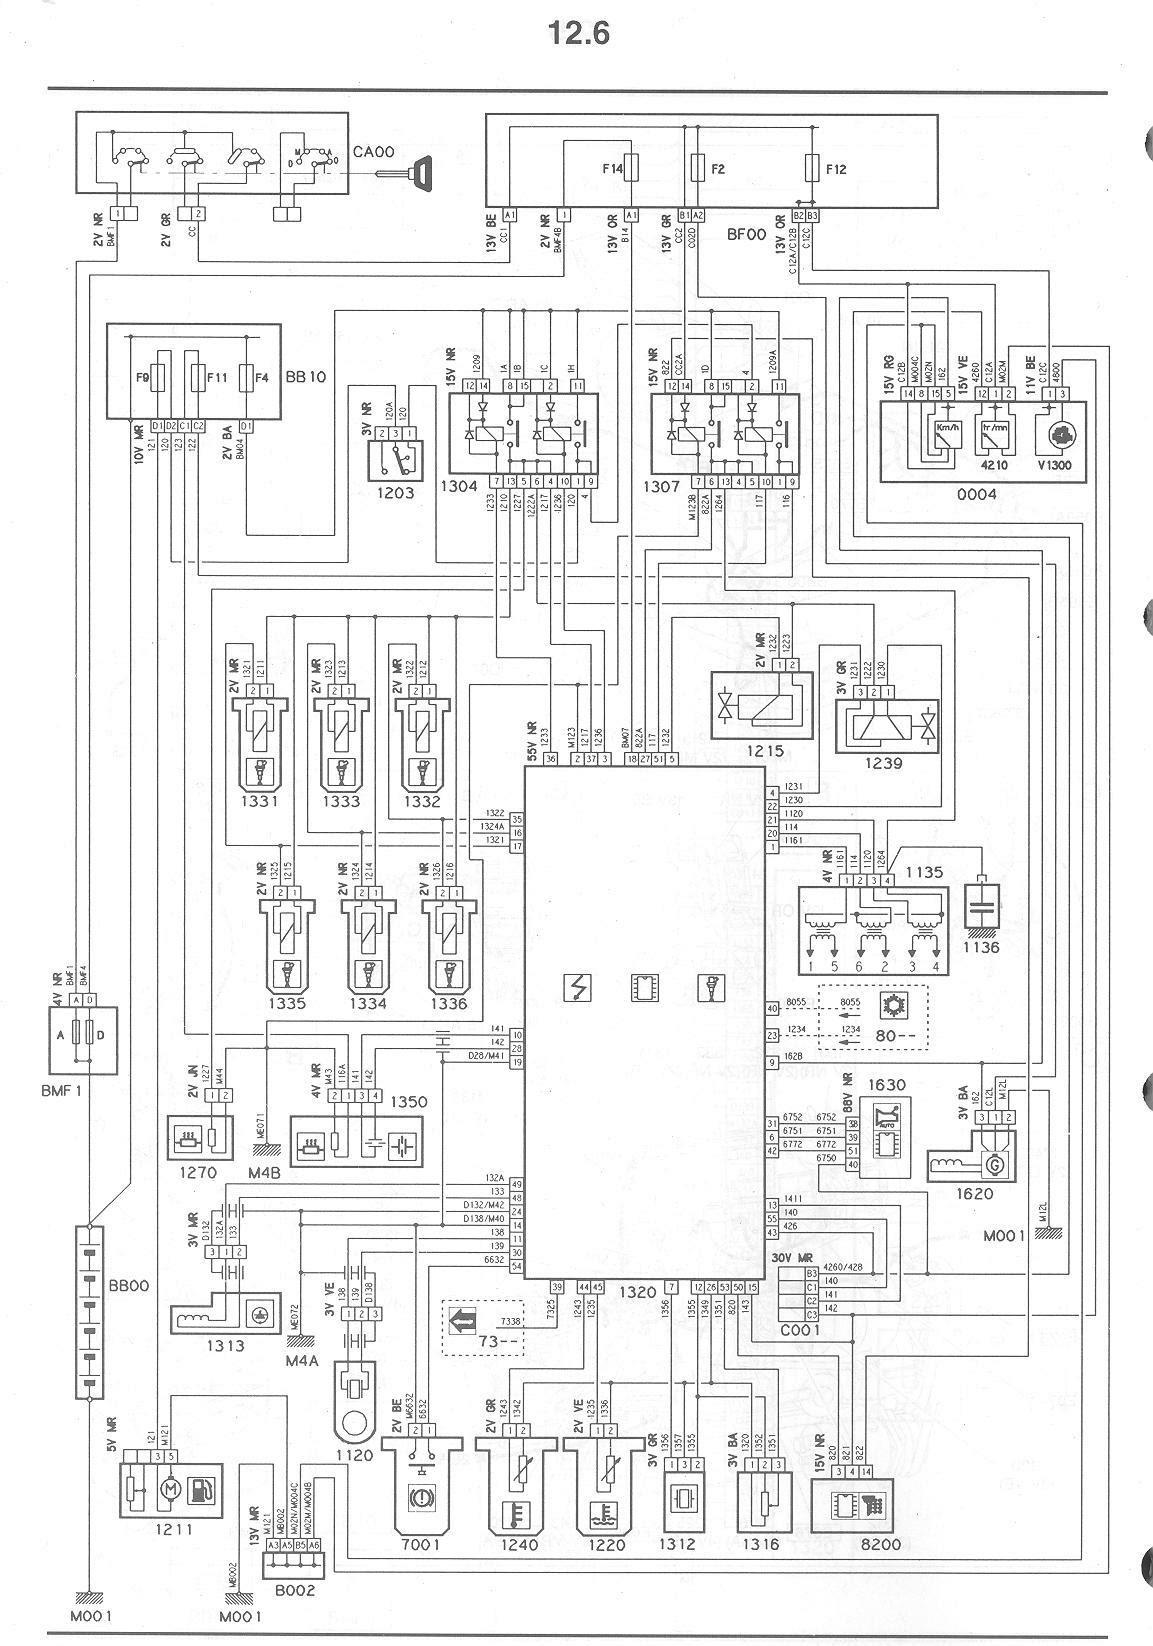 2003 Citroen Xsara Fuse Box Diagram